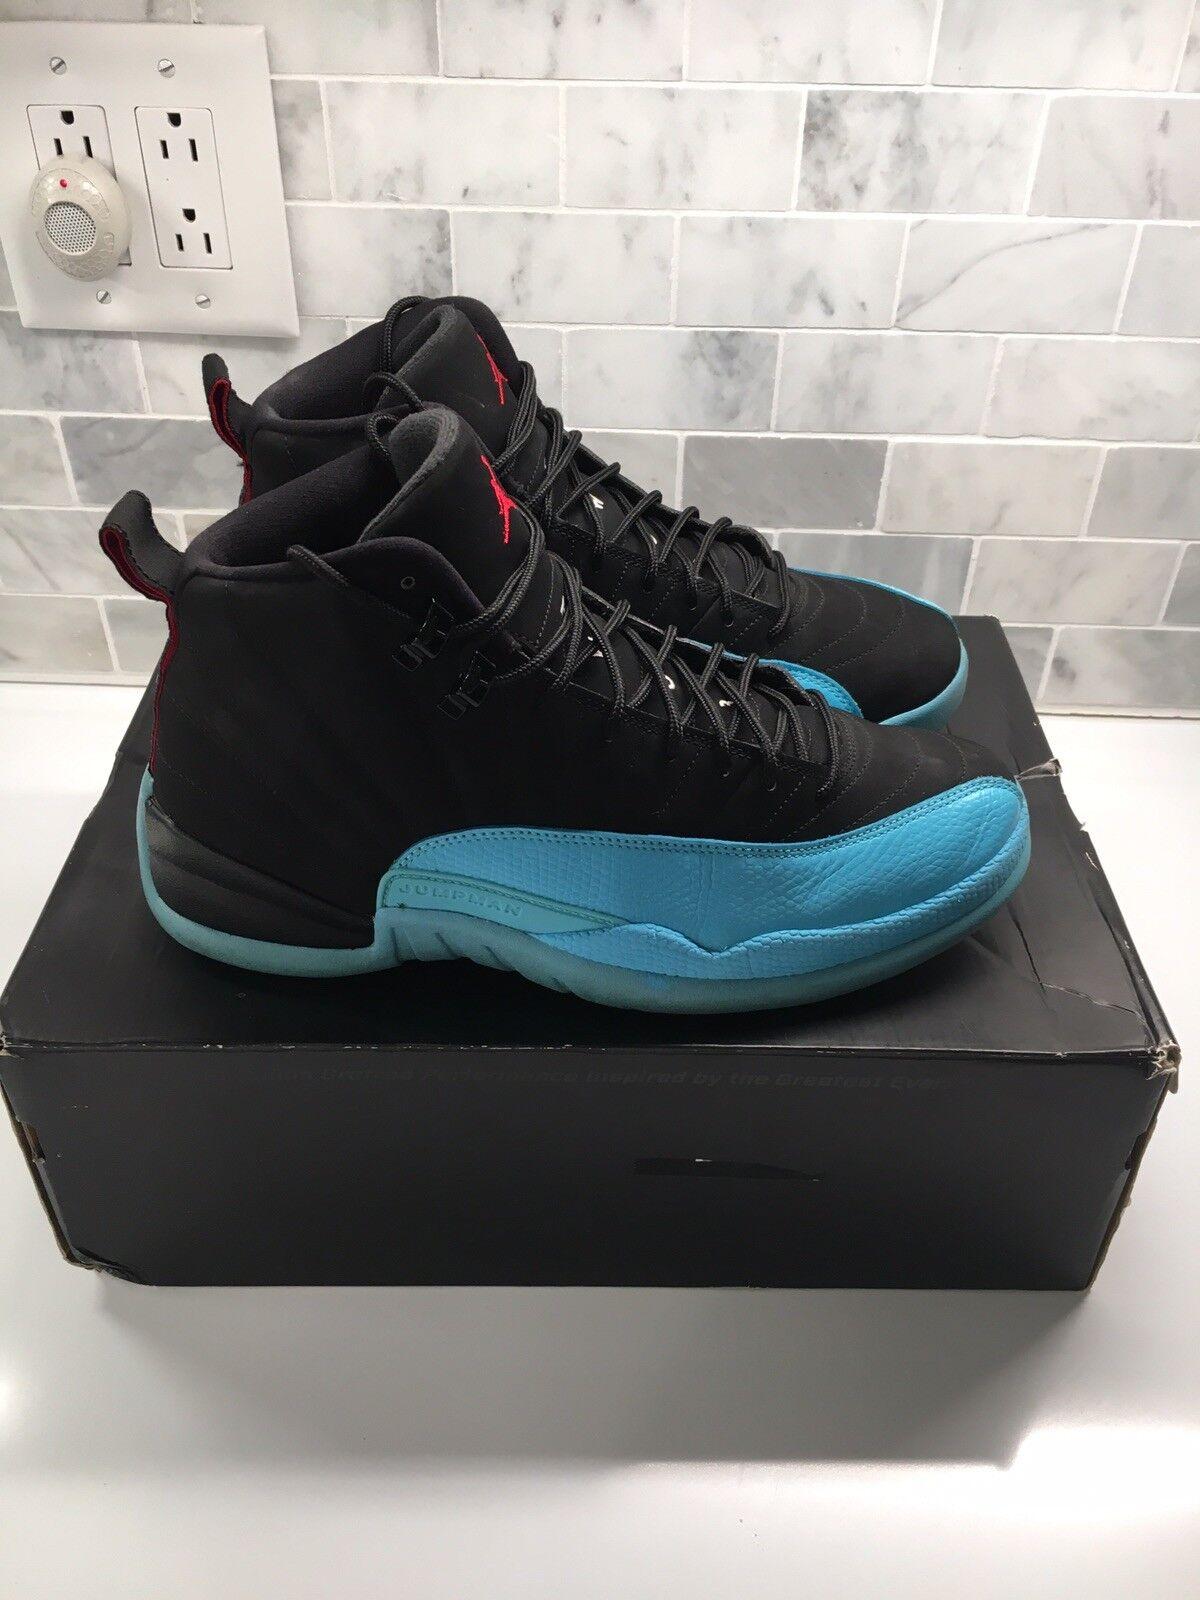 7e73c06670e8 Nike Air Jordan XII 12 Retro Black Gamma Blue 130690-027 Retro Size-8.5  P8 N305 4f9bee